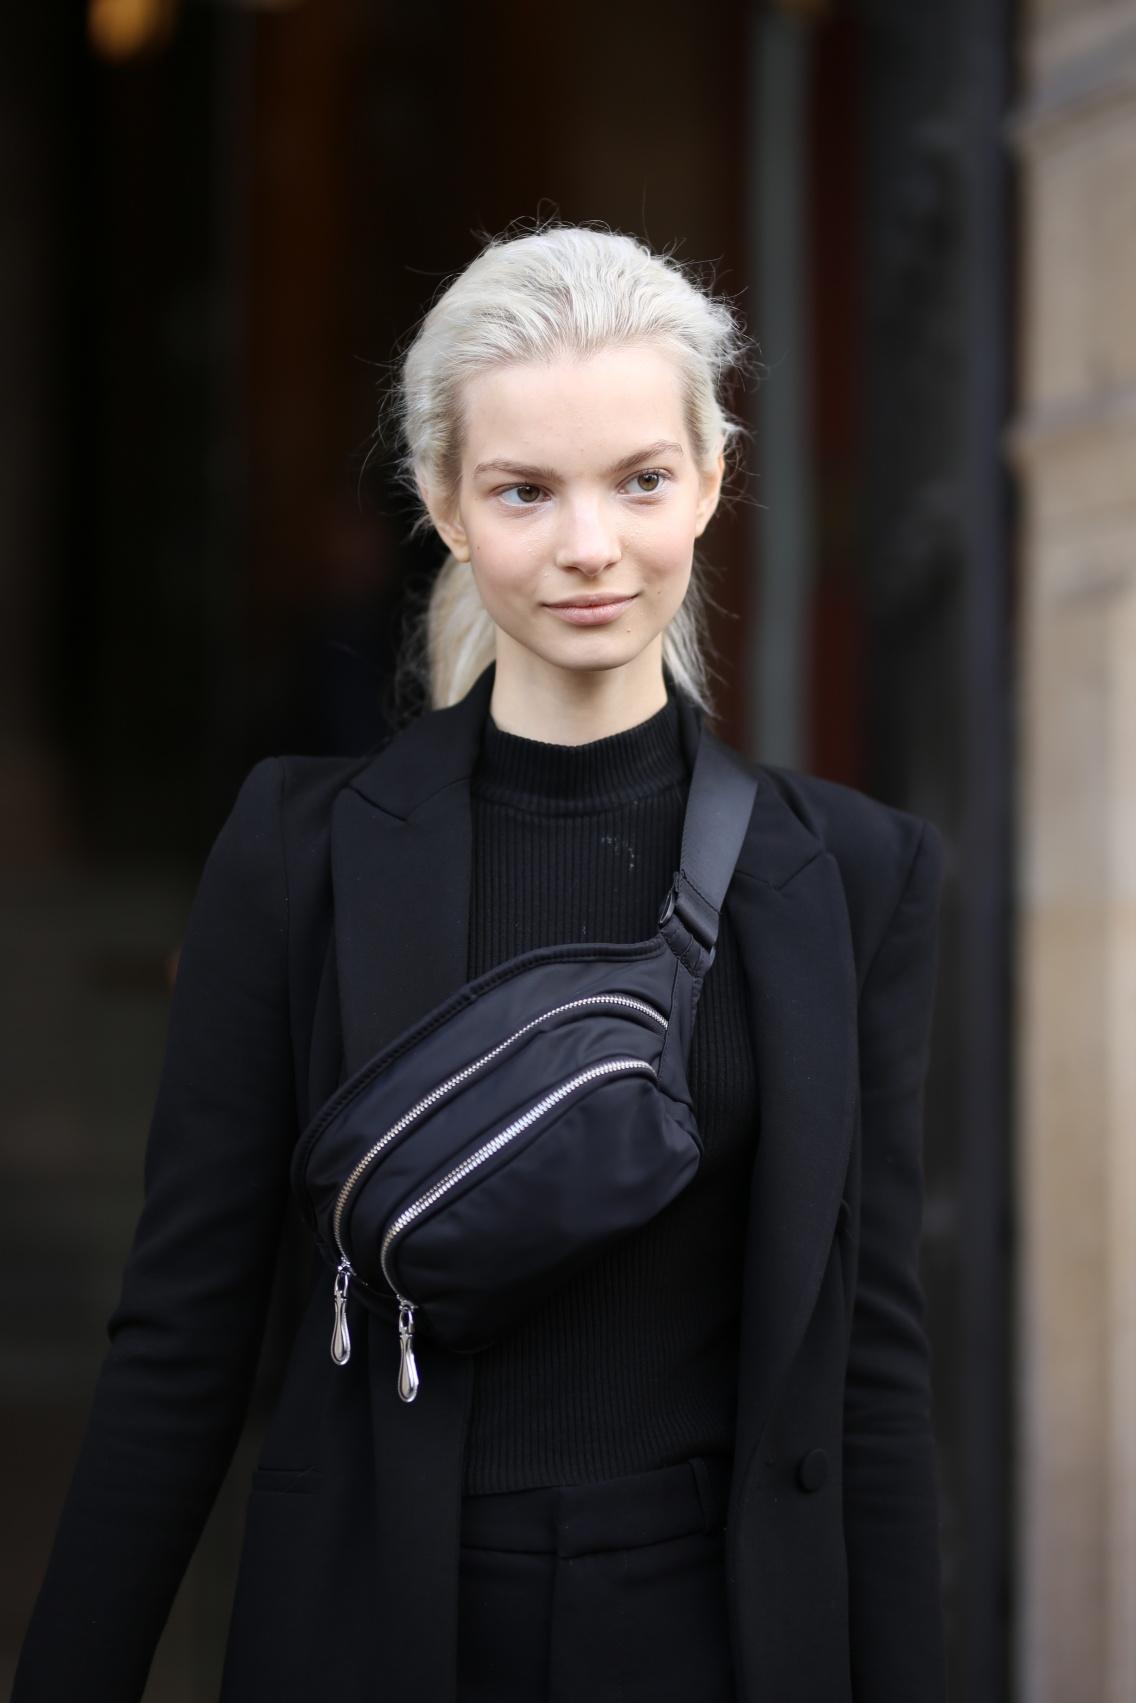 z_nastya zhuleva beautiful people